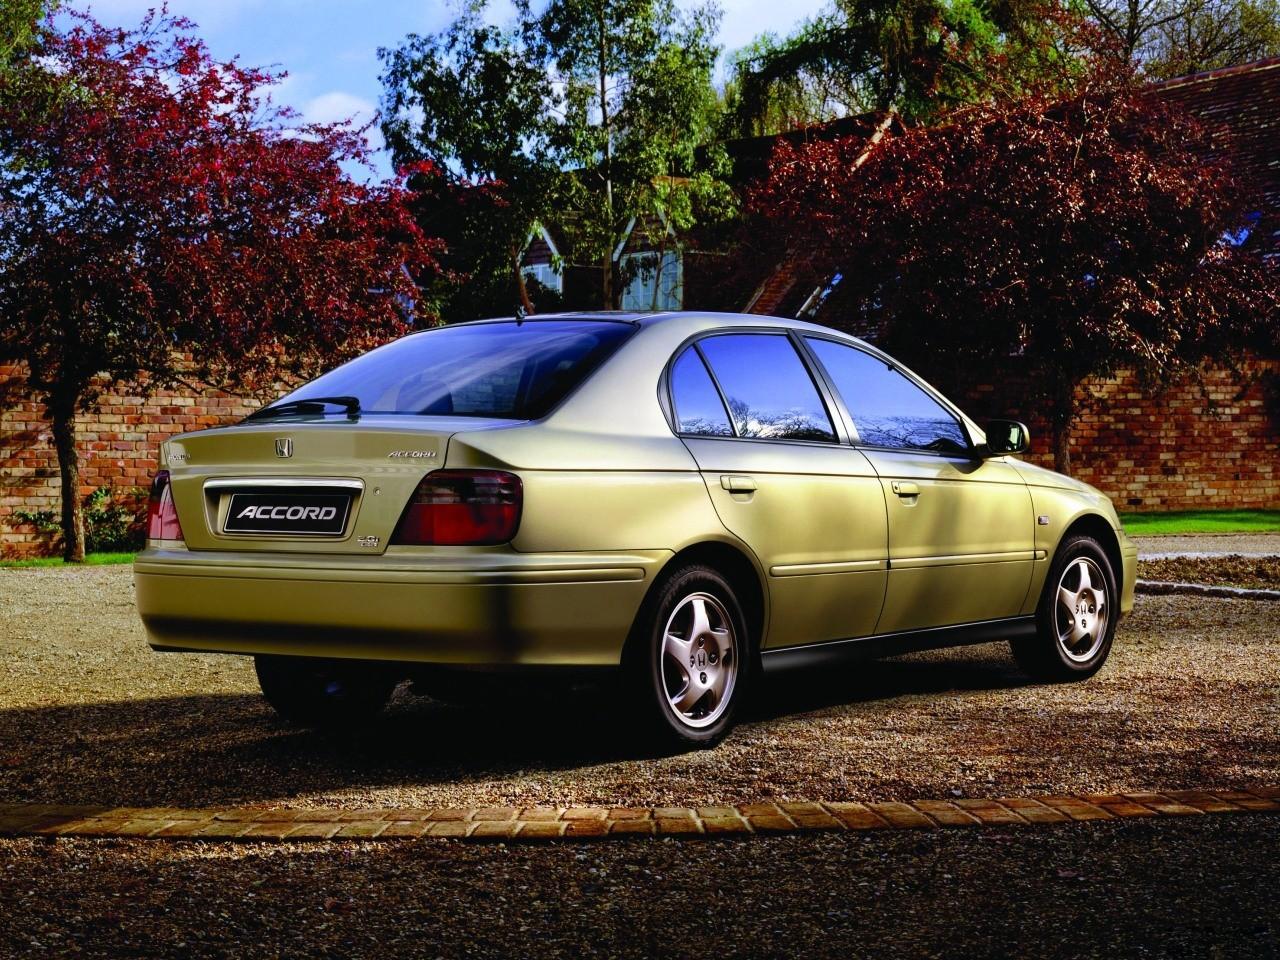 HONDA Accord 4 Doors - 1998, 1999, 2000, 2001, 2002, 2003, 2004, 2005 - autoevolution